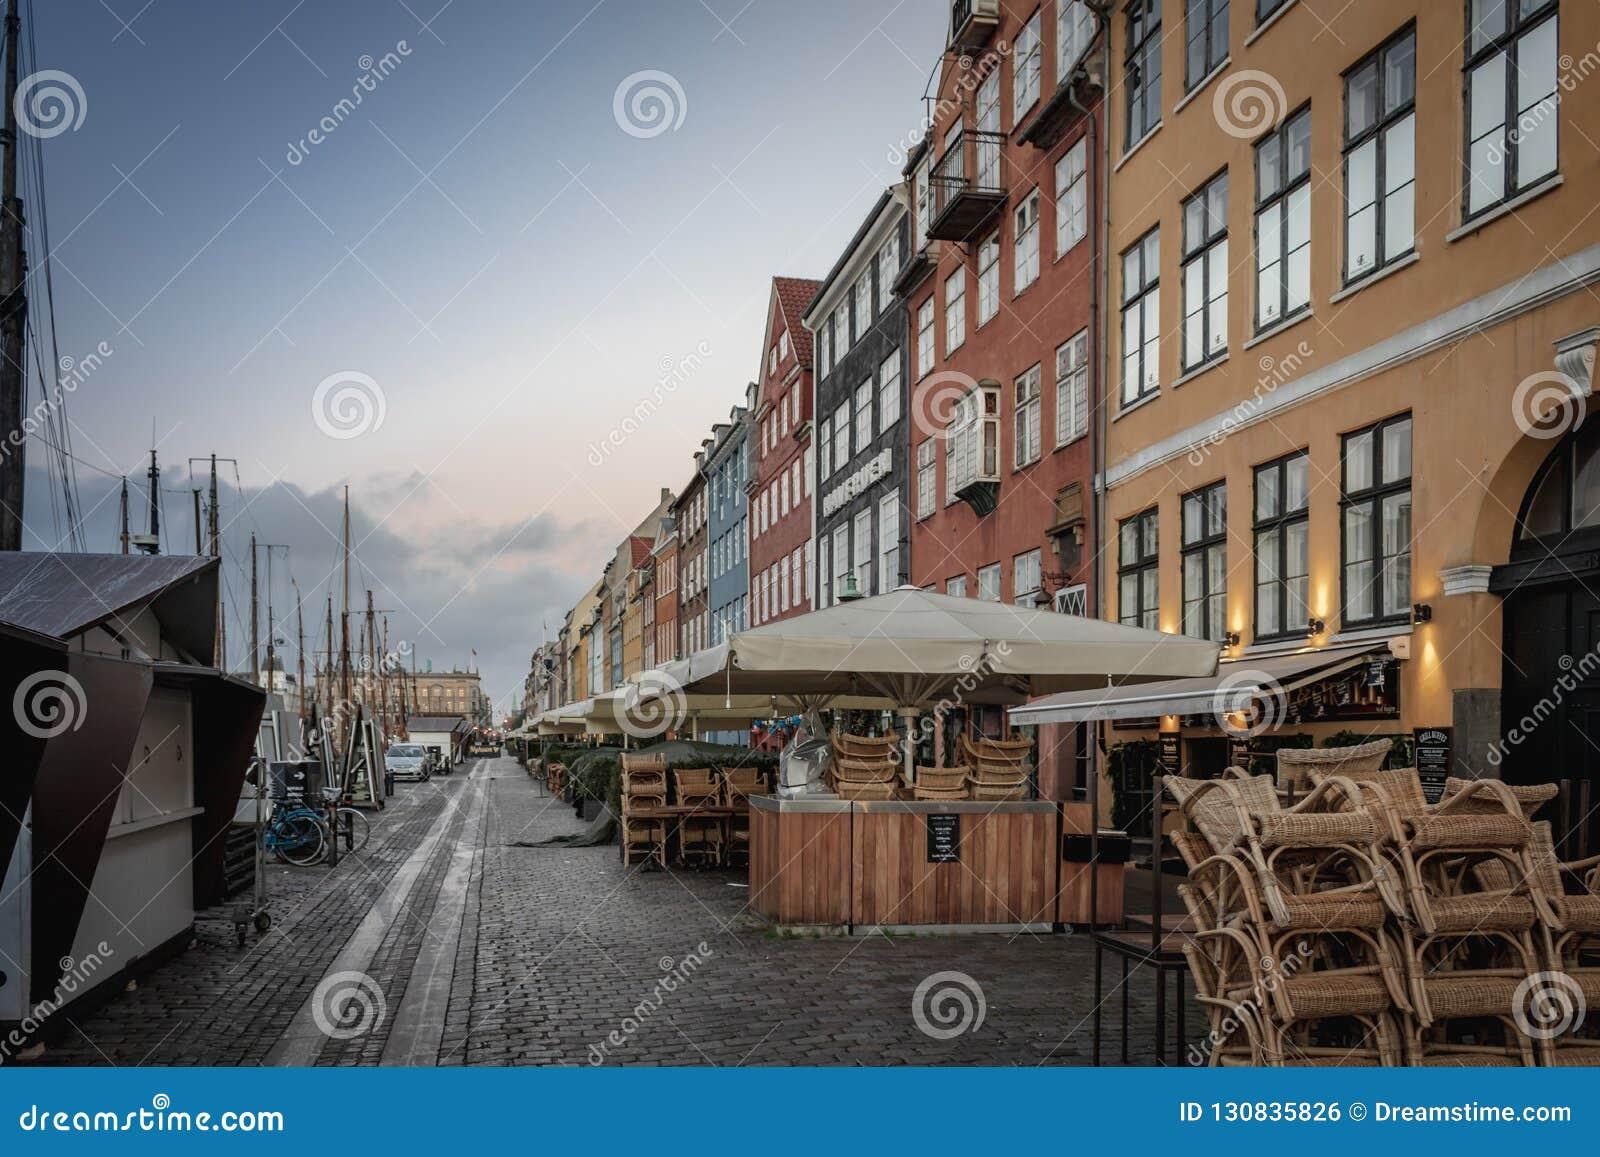 Copenhagen Nyhavn harbor in an early morning